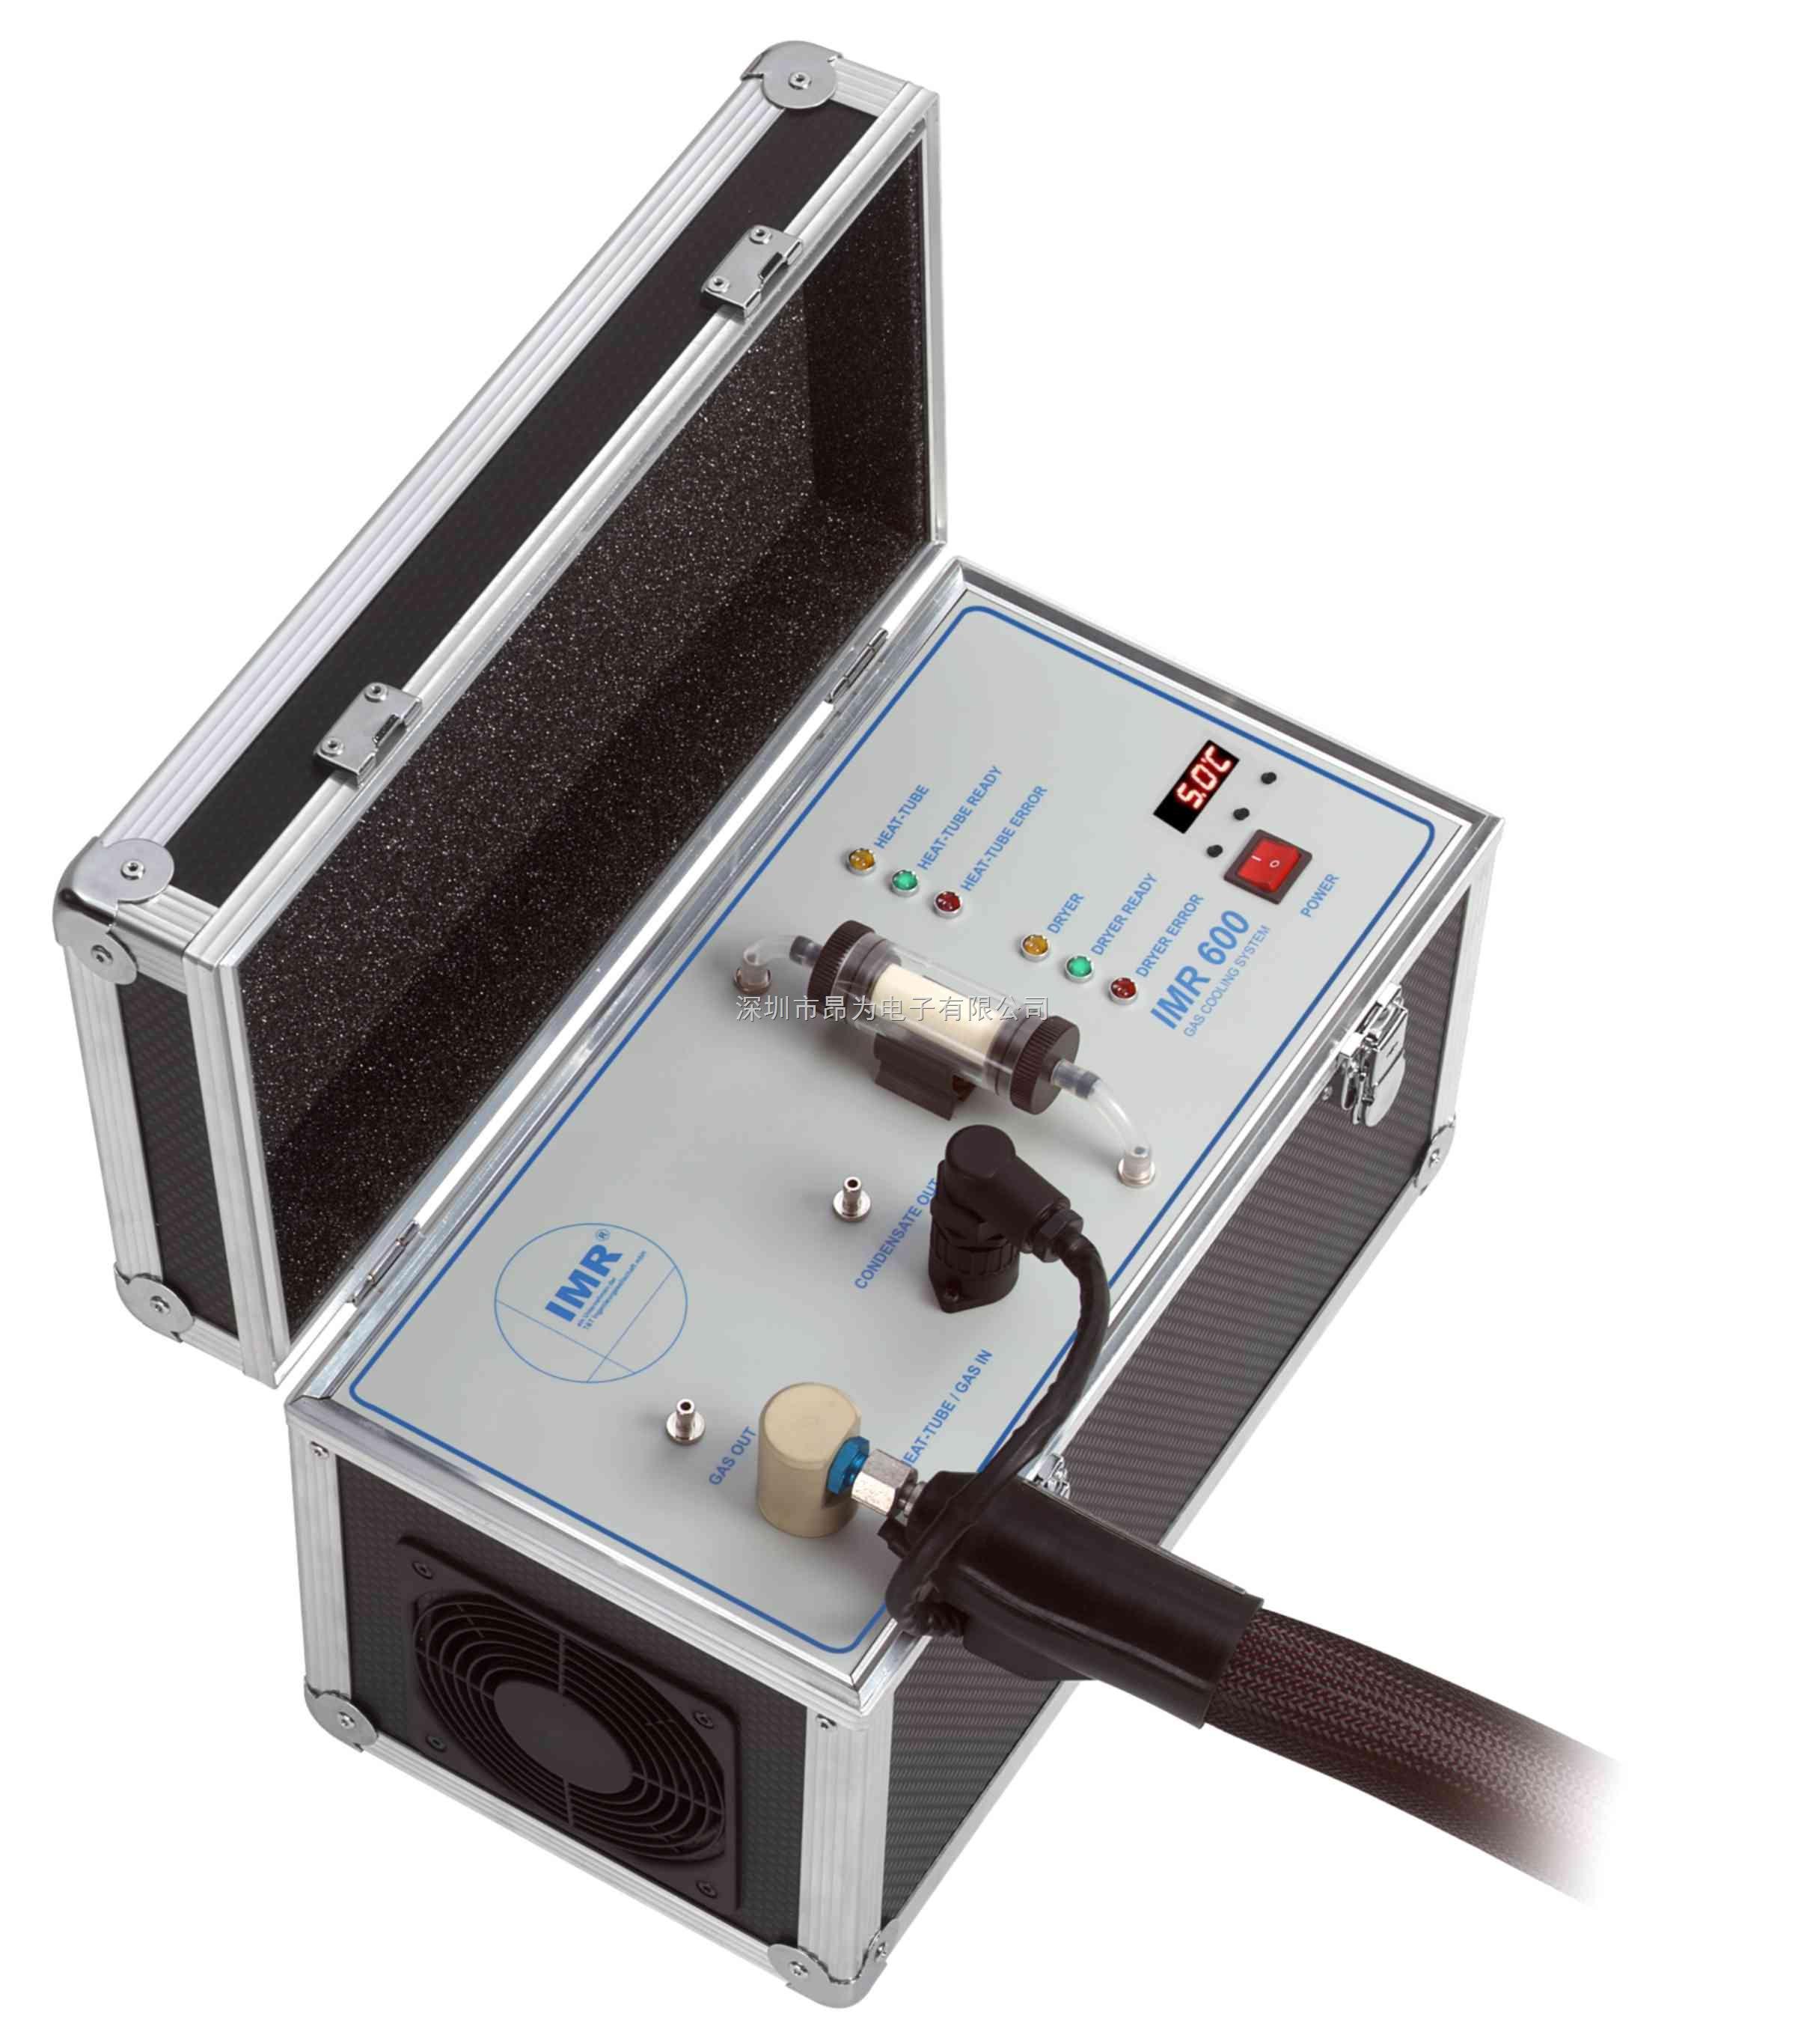 IMR1600-IMR 1600 便携式红外烟气分析仪